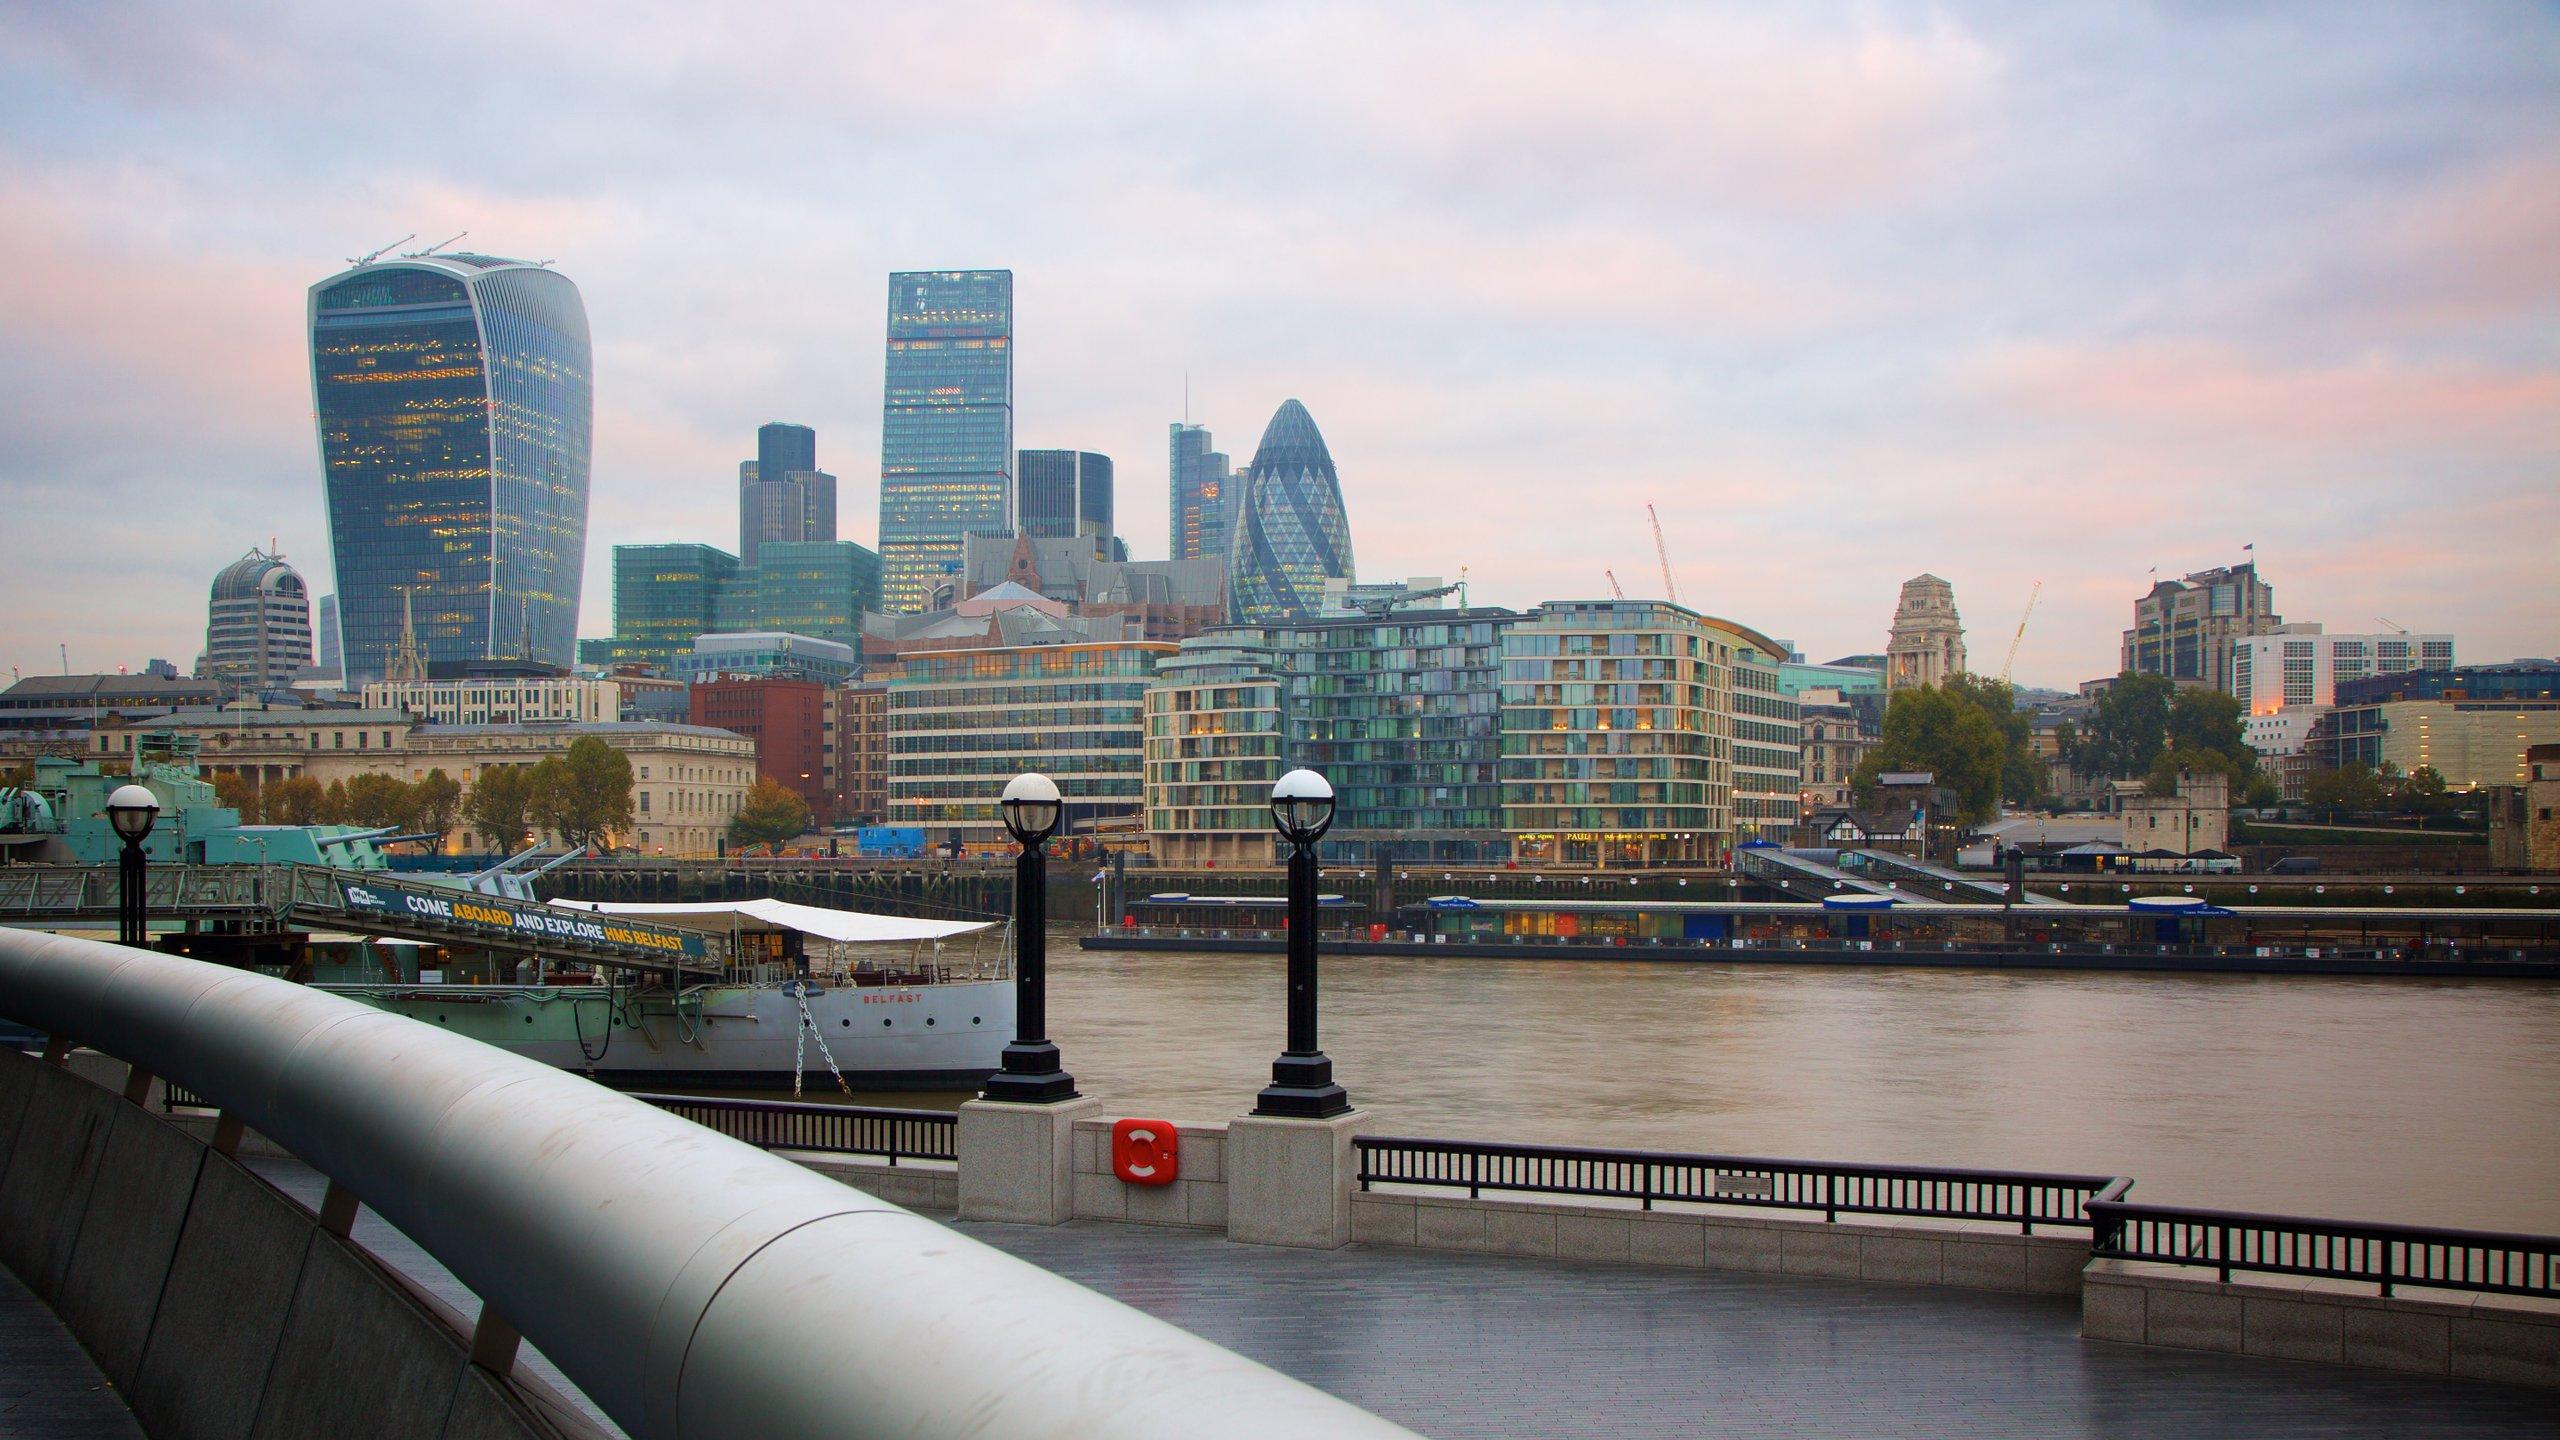 The City of London, London, England, United Kingdom